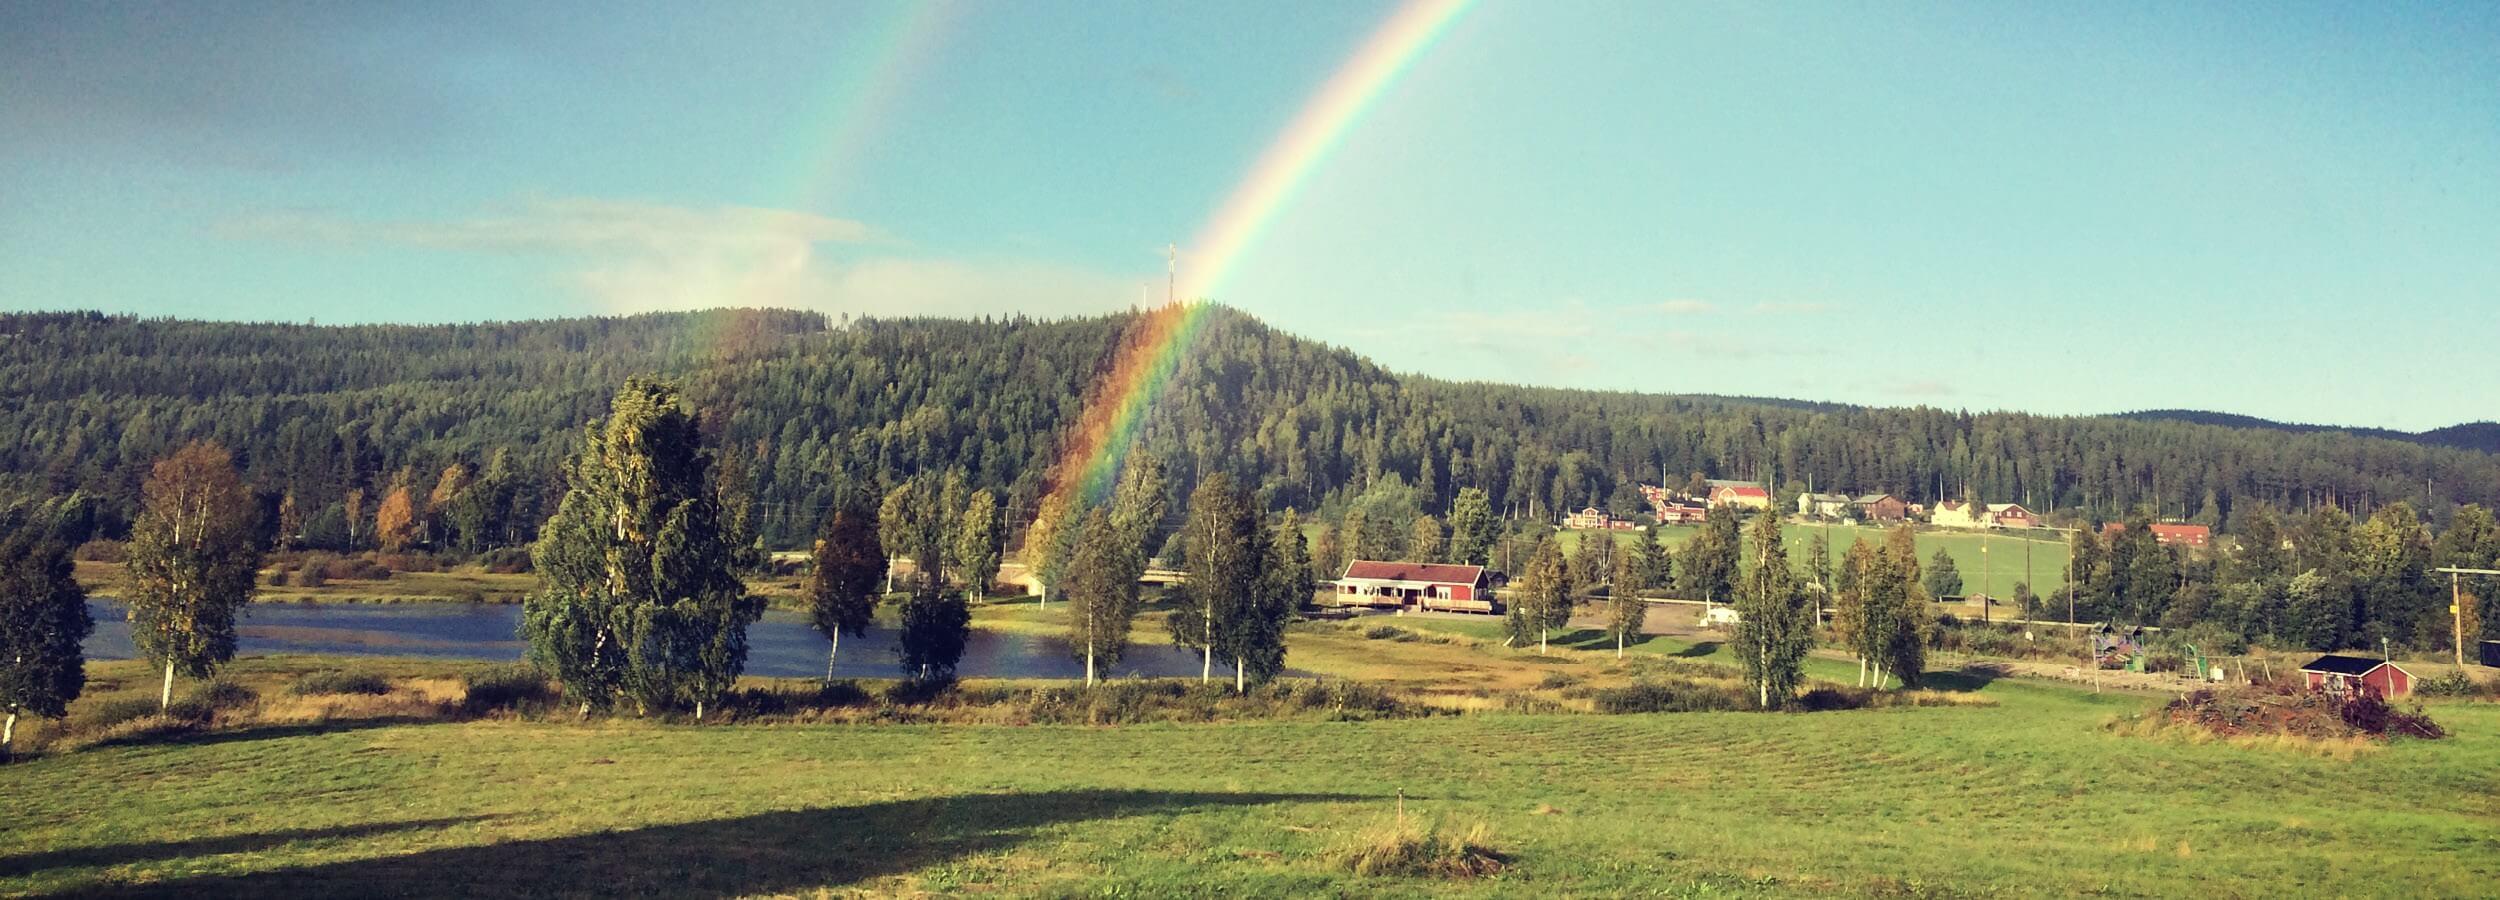 Gallery - rainbow.jpg